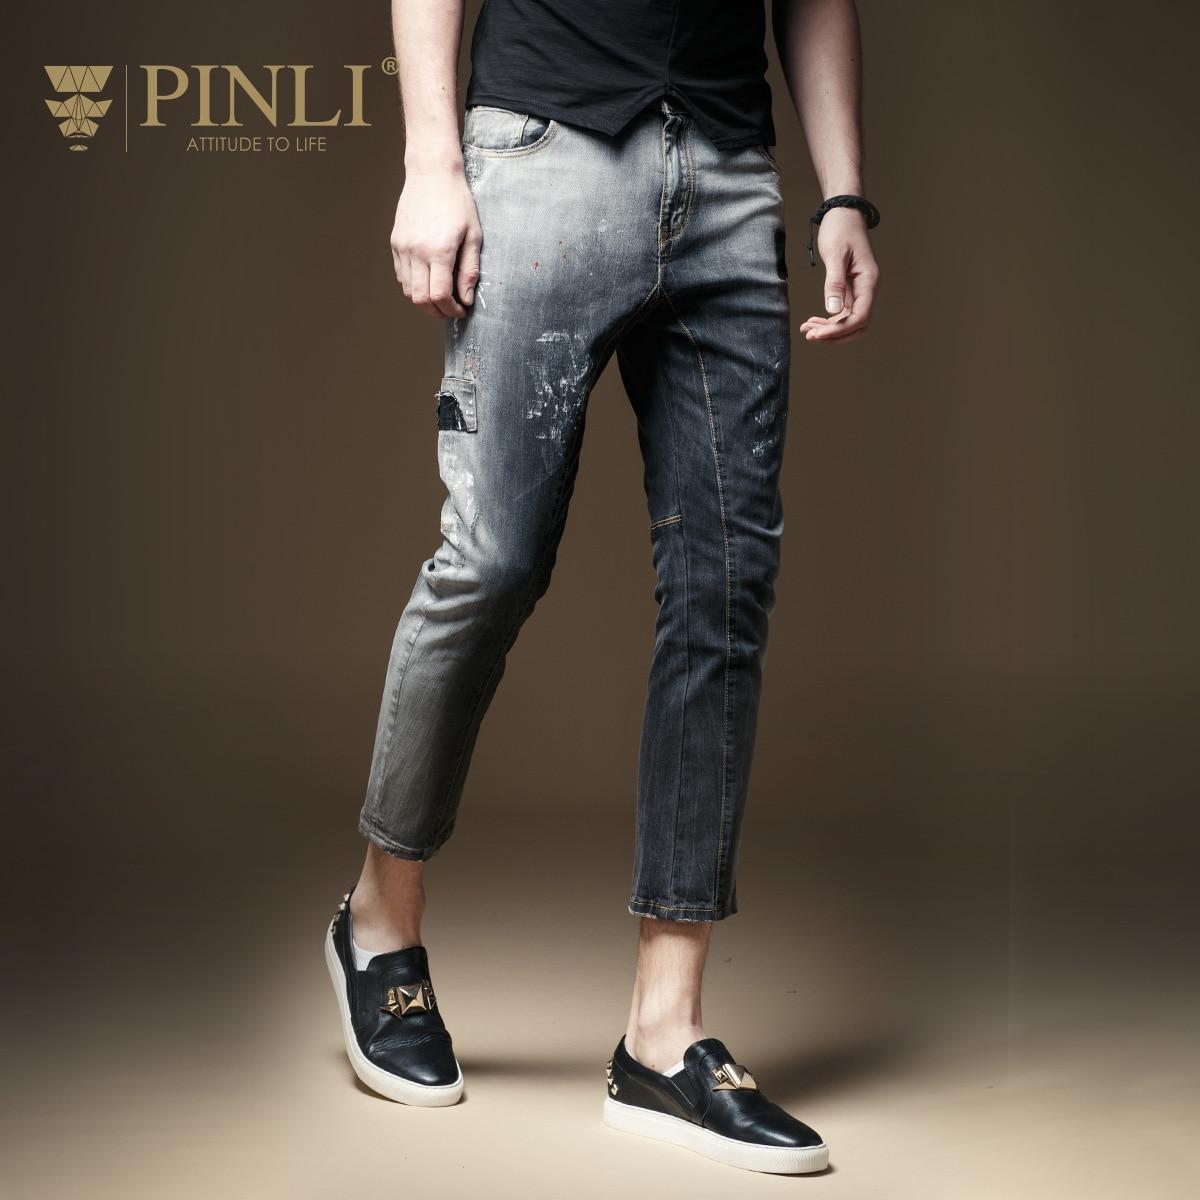 2019 Zipper Fly Light Mid New Top Knee Length Slim Pinli Pin Li Summer Men's Jeans Jeans, Body Wash, Old Nine Pants D182116521